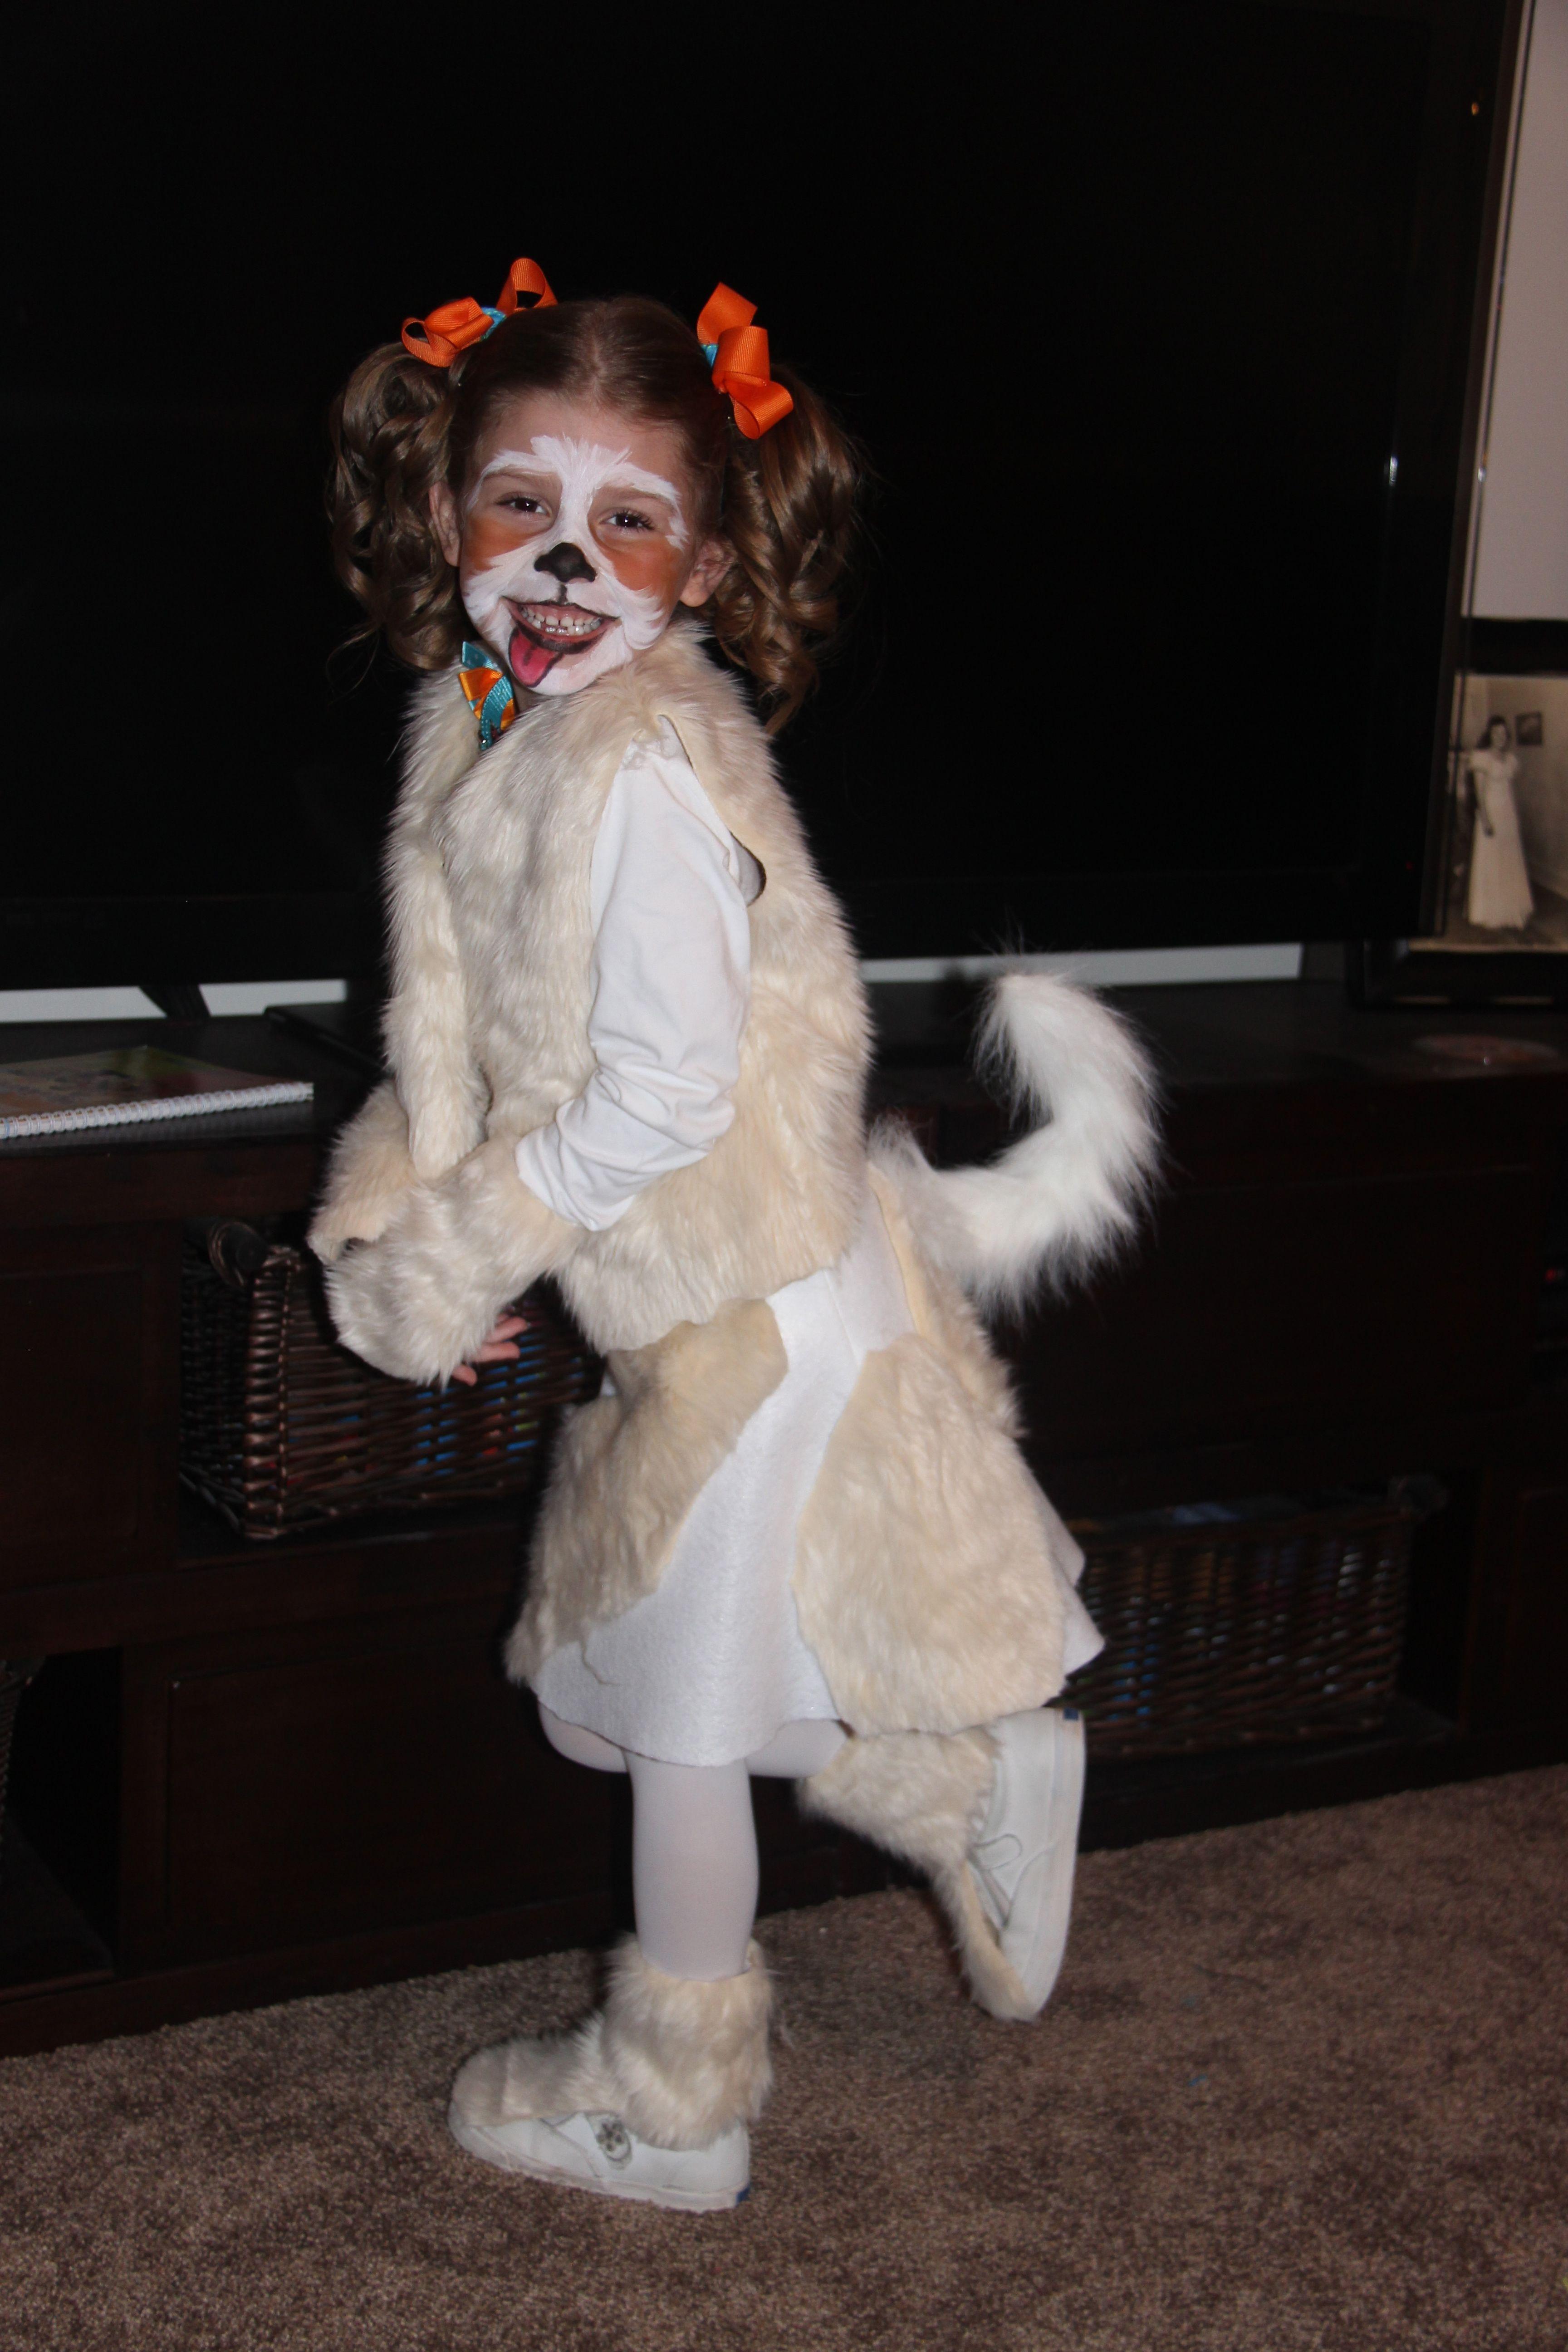 Puppy Dog Doggie Face Paint Costume Child Halloween Pinterest